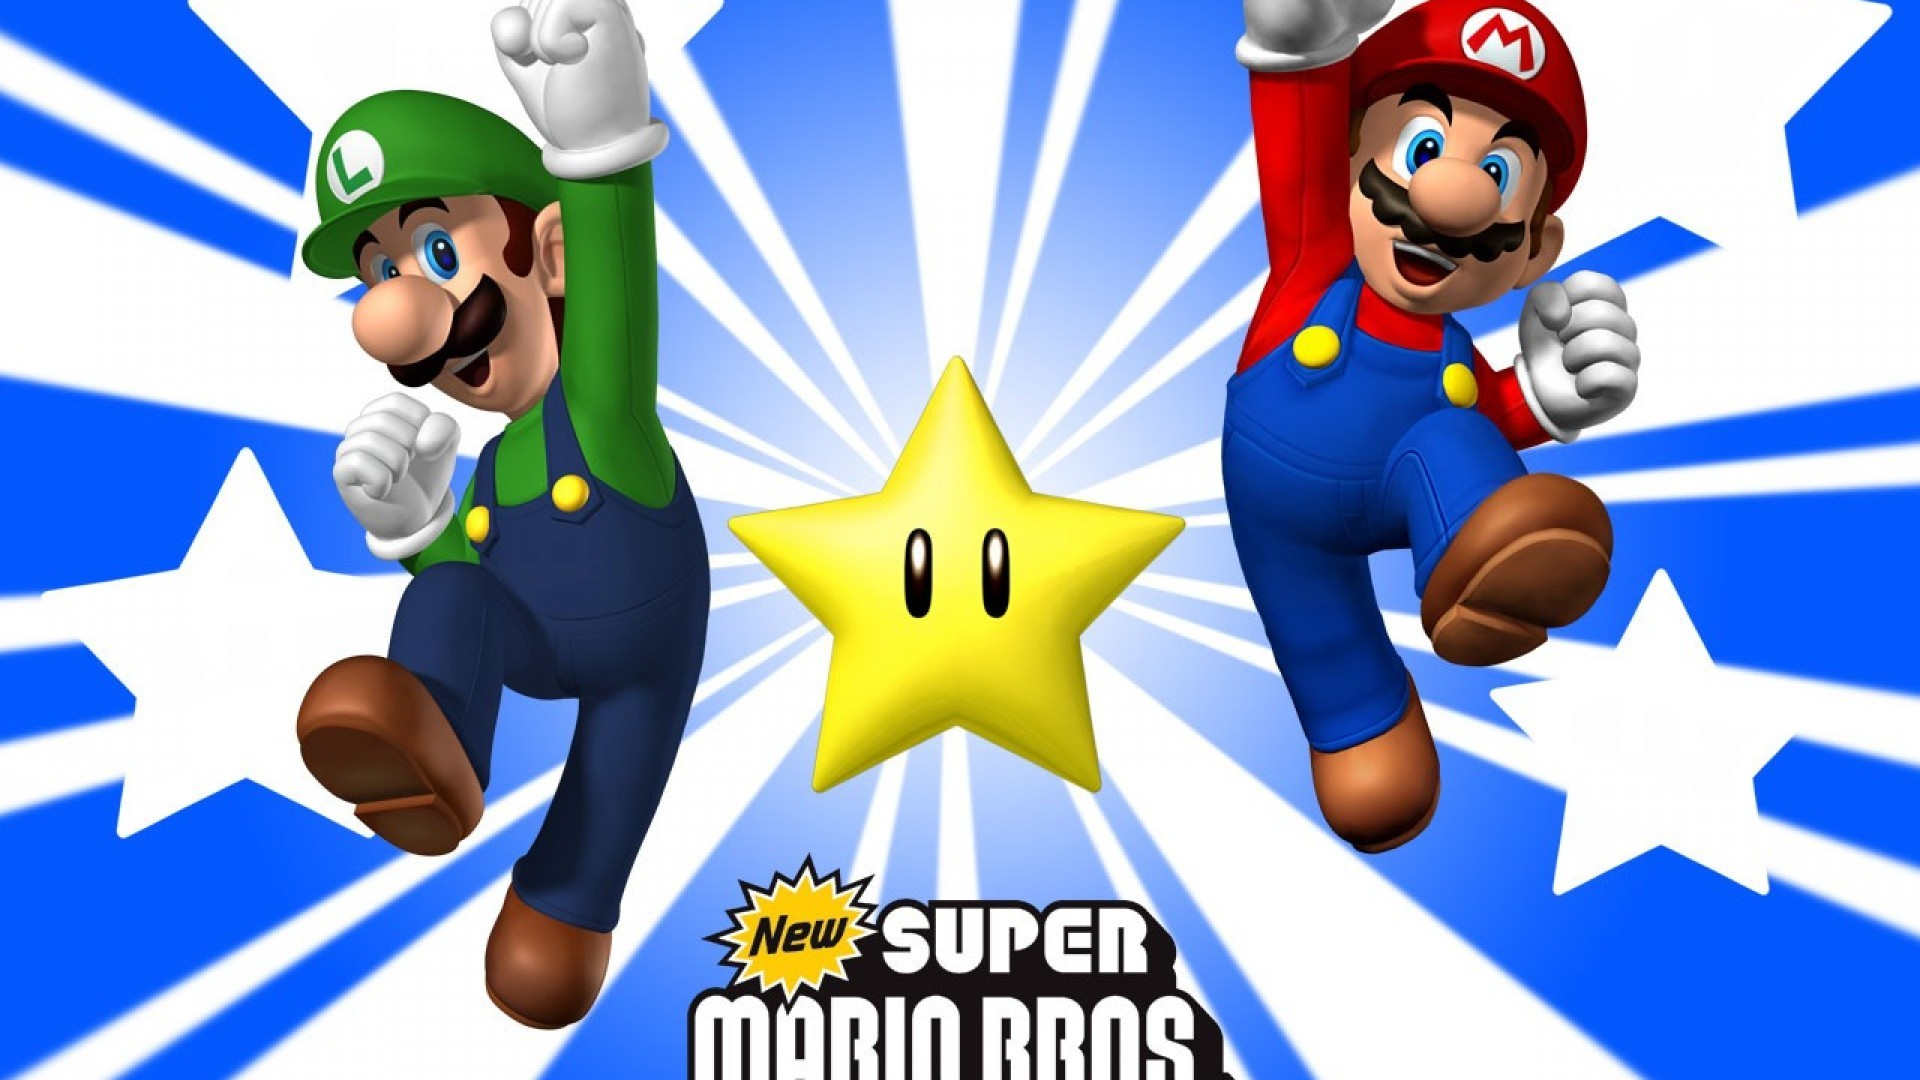 Mario And Luigi Backgrounds 54 Images